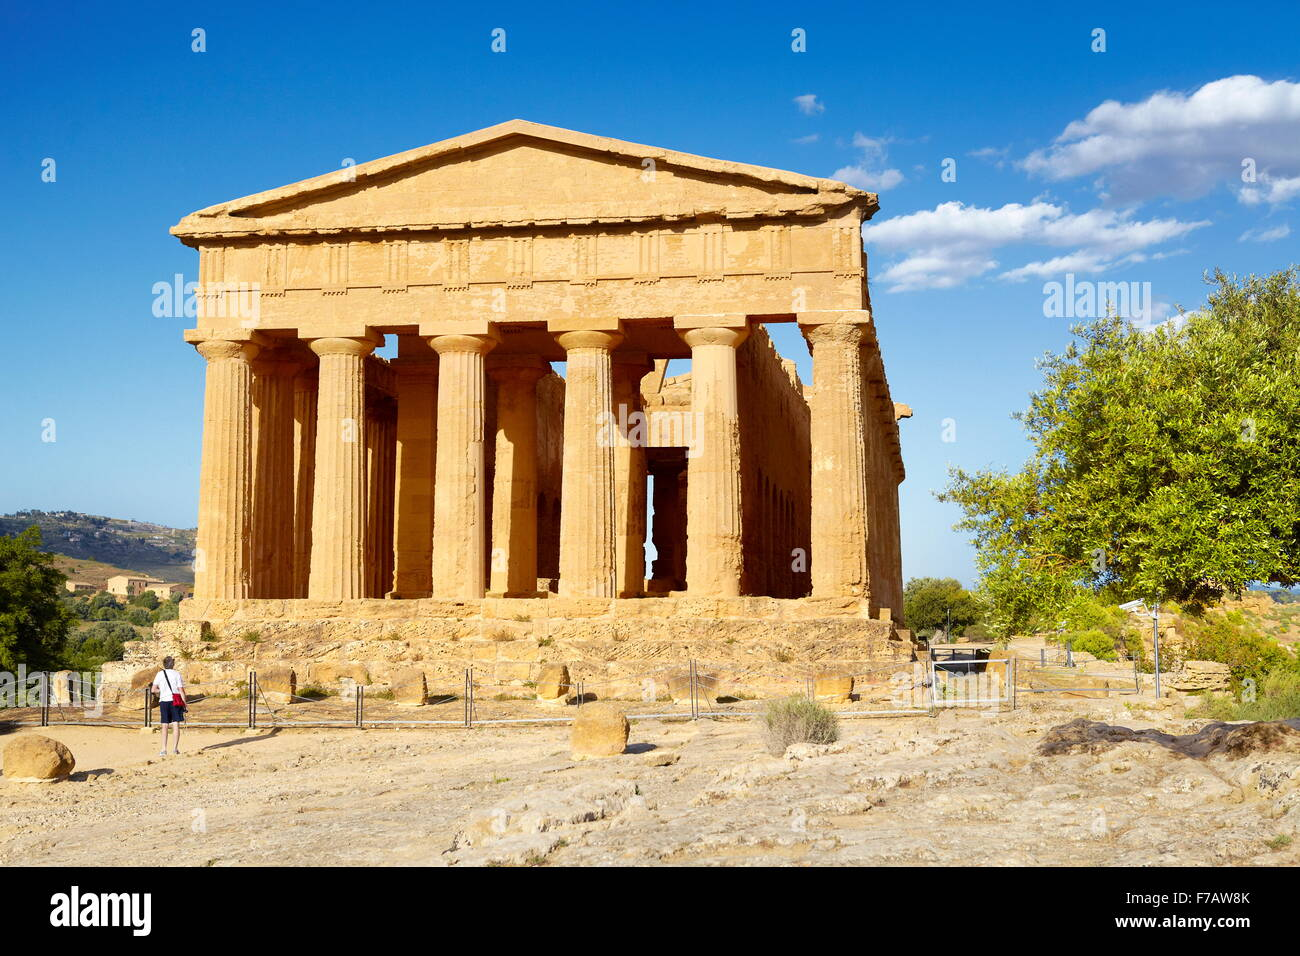 Sizilien-Insel - Tempel der Concordia, Tal der Tempel (Valle dei Templi), Agrigento, Italien-UNESCO Stockbild